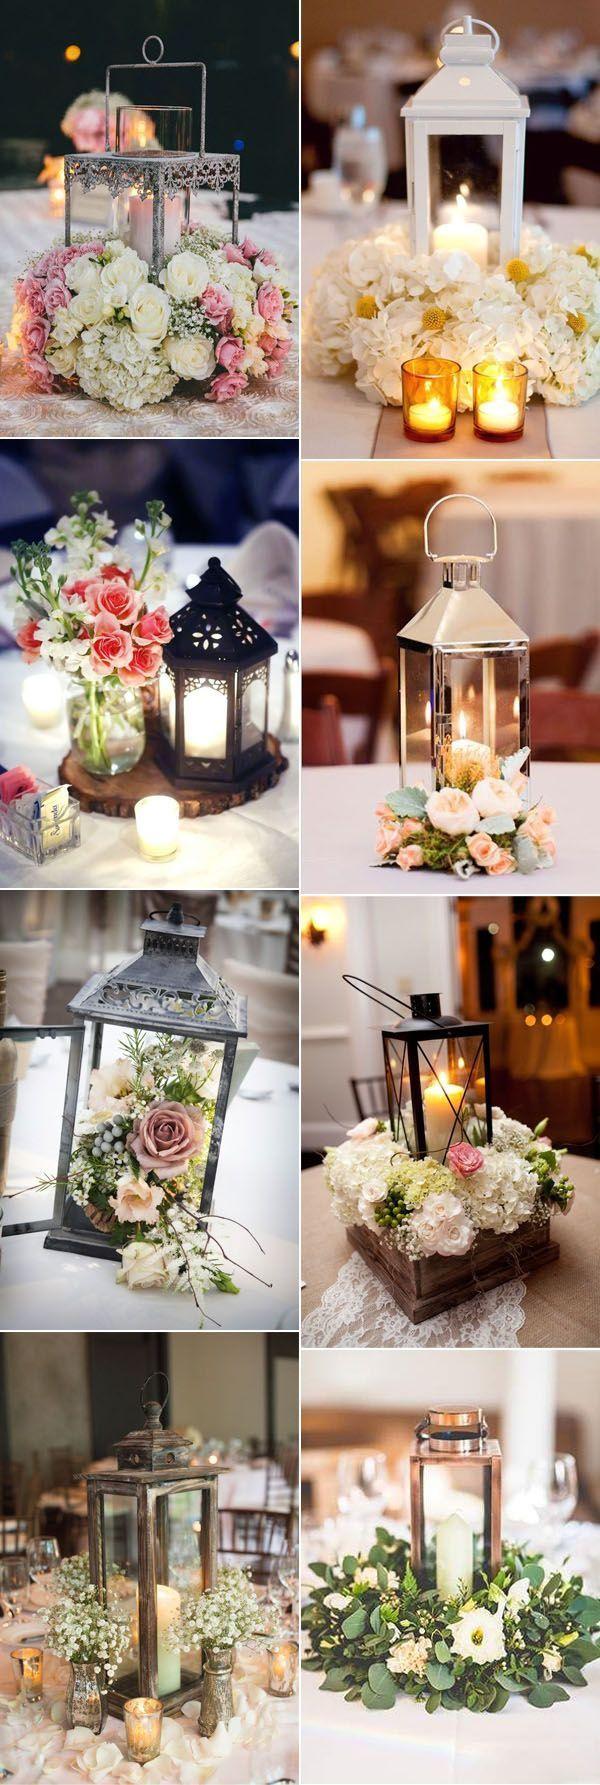 gorgeous lantern and floral wedding centerpieces ideas